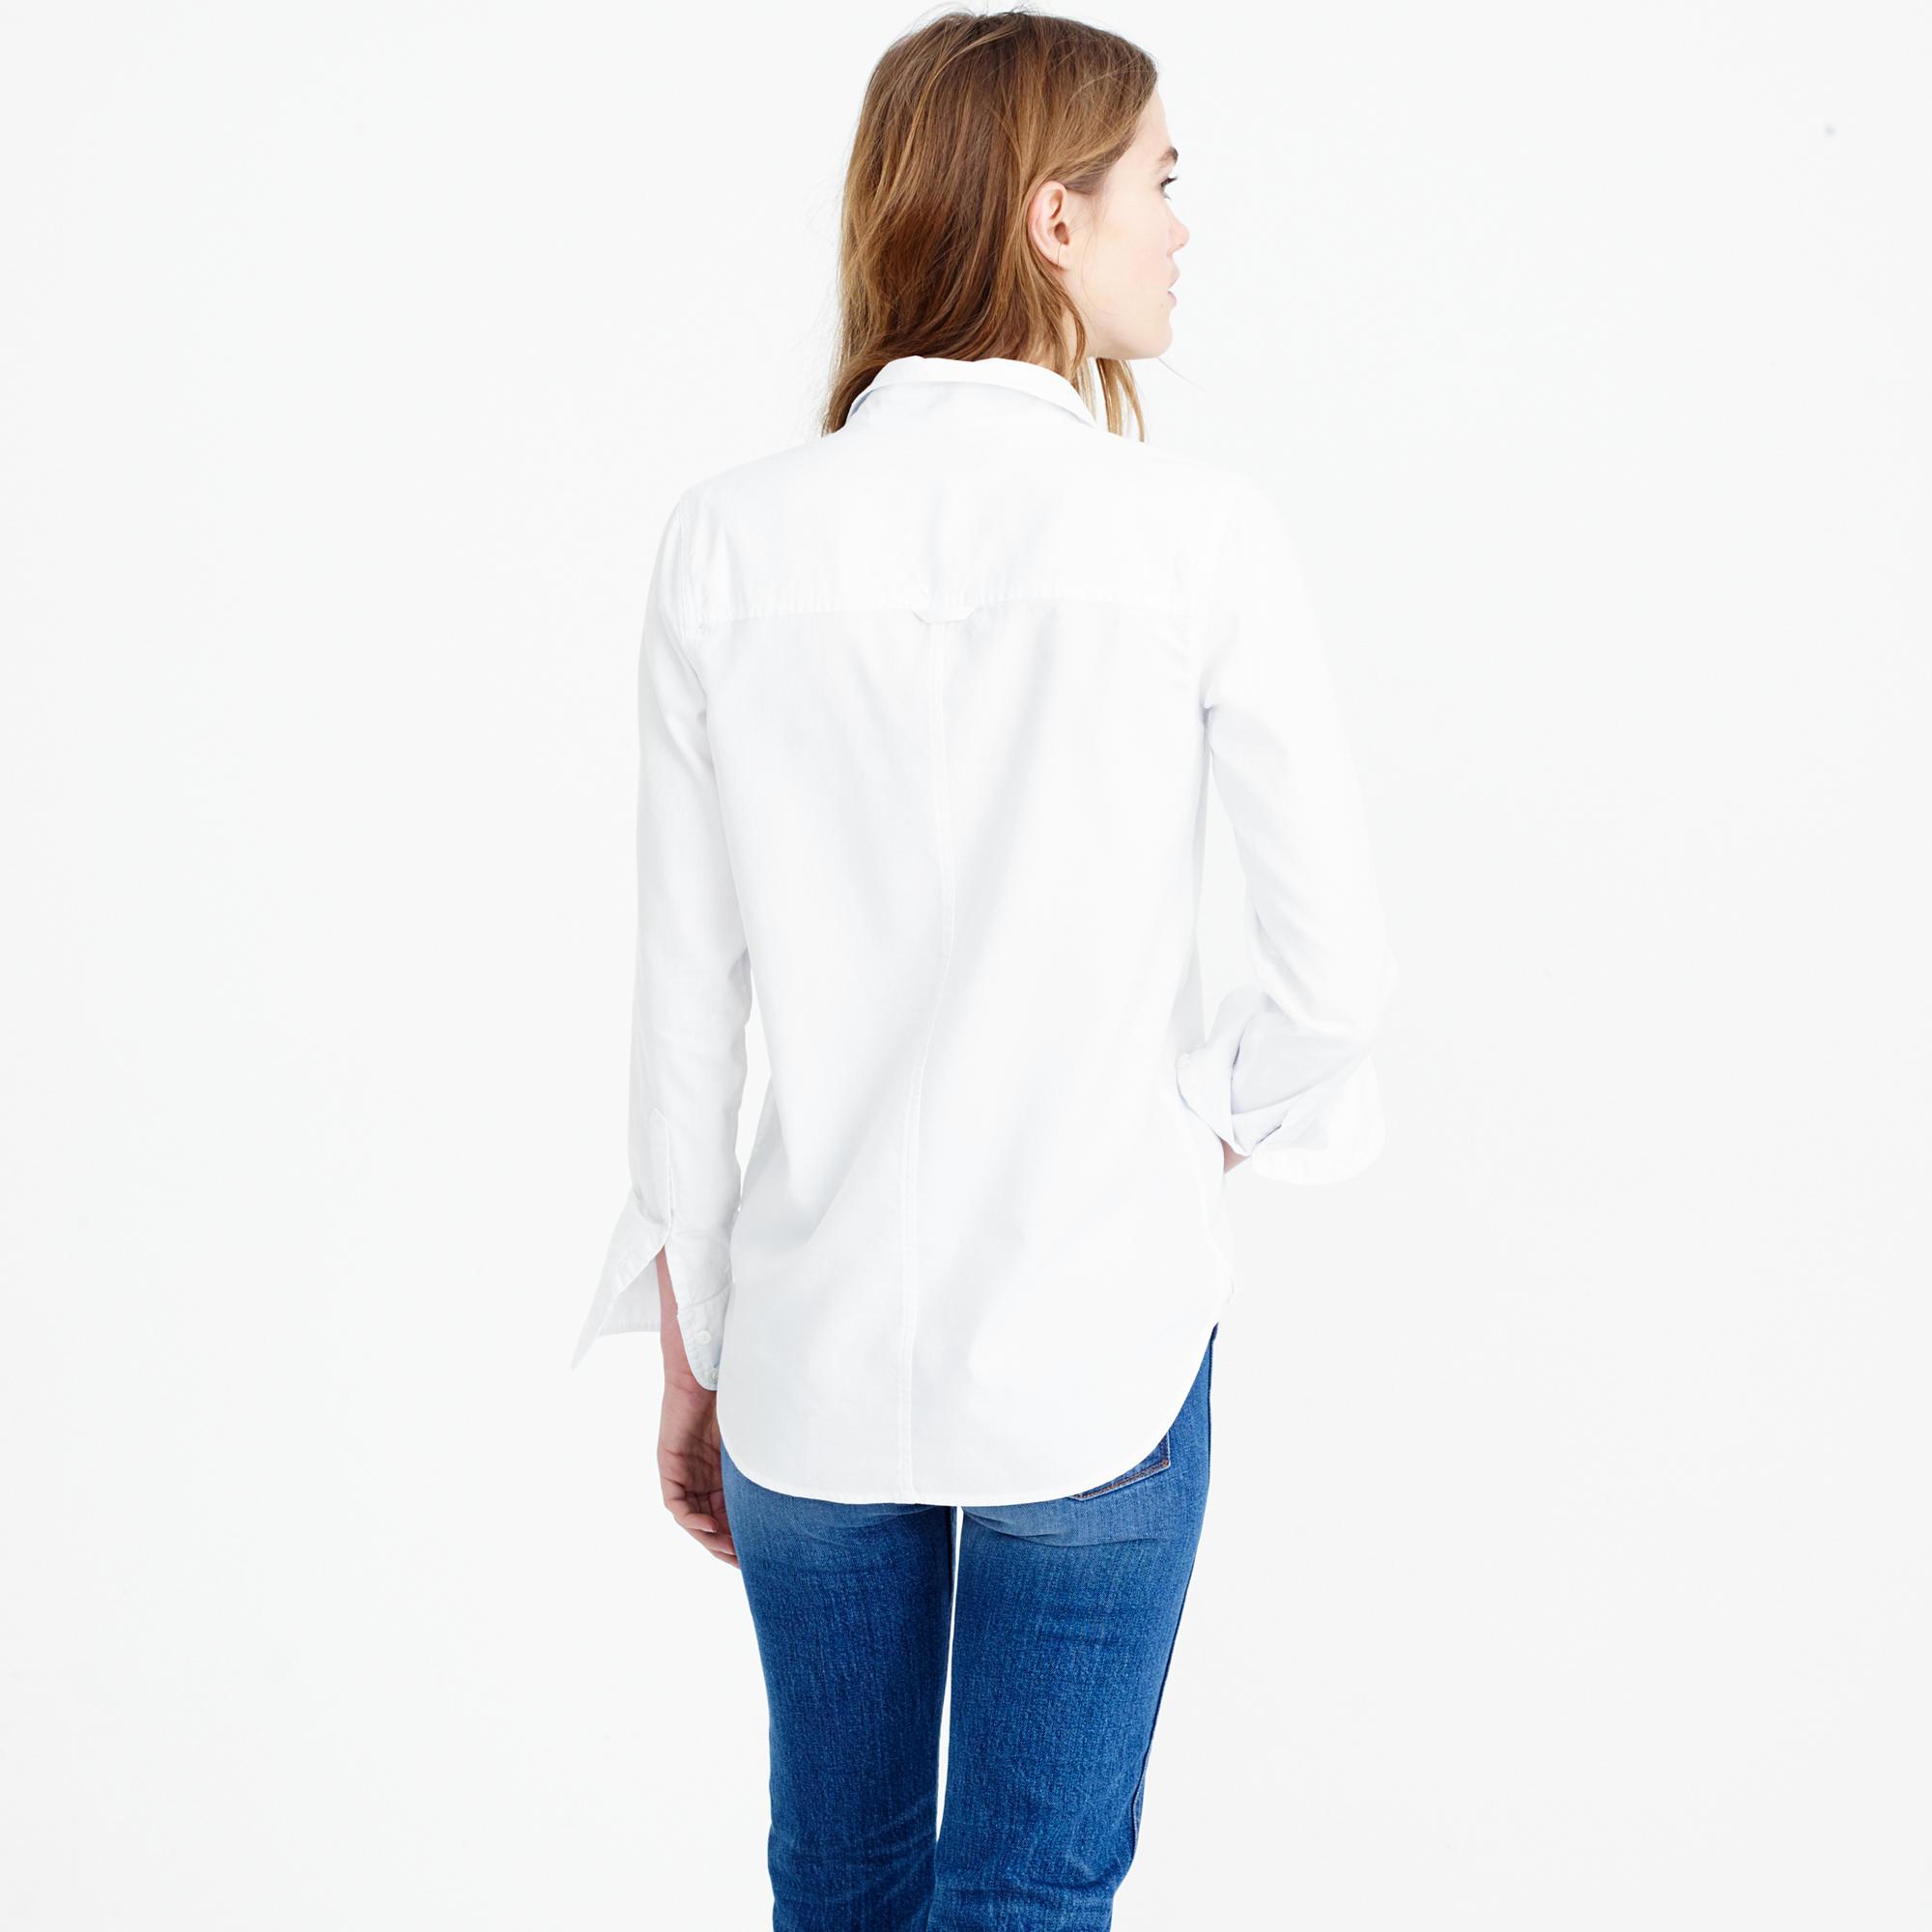 J Crew Boy Shirt In Cotton Tencel Oxford In White Lyst